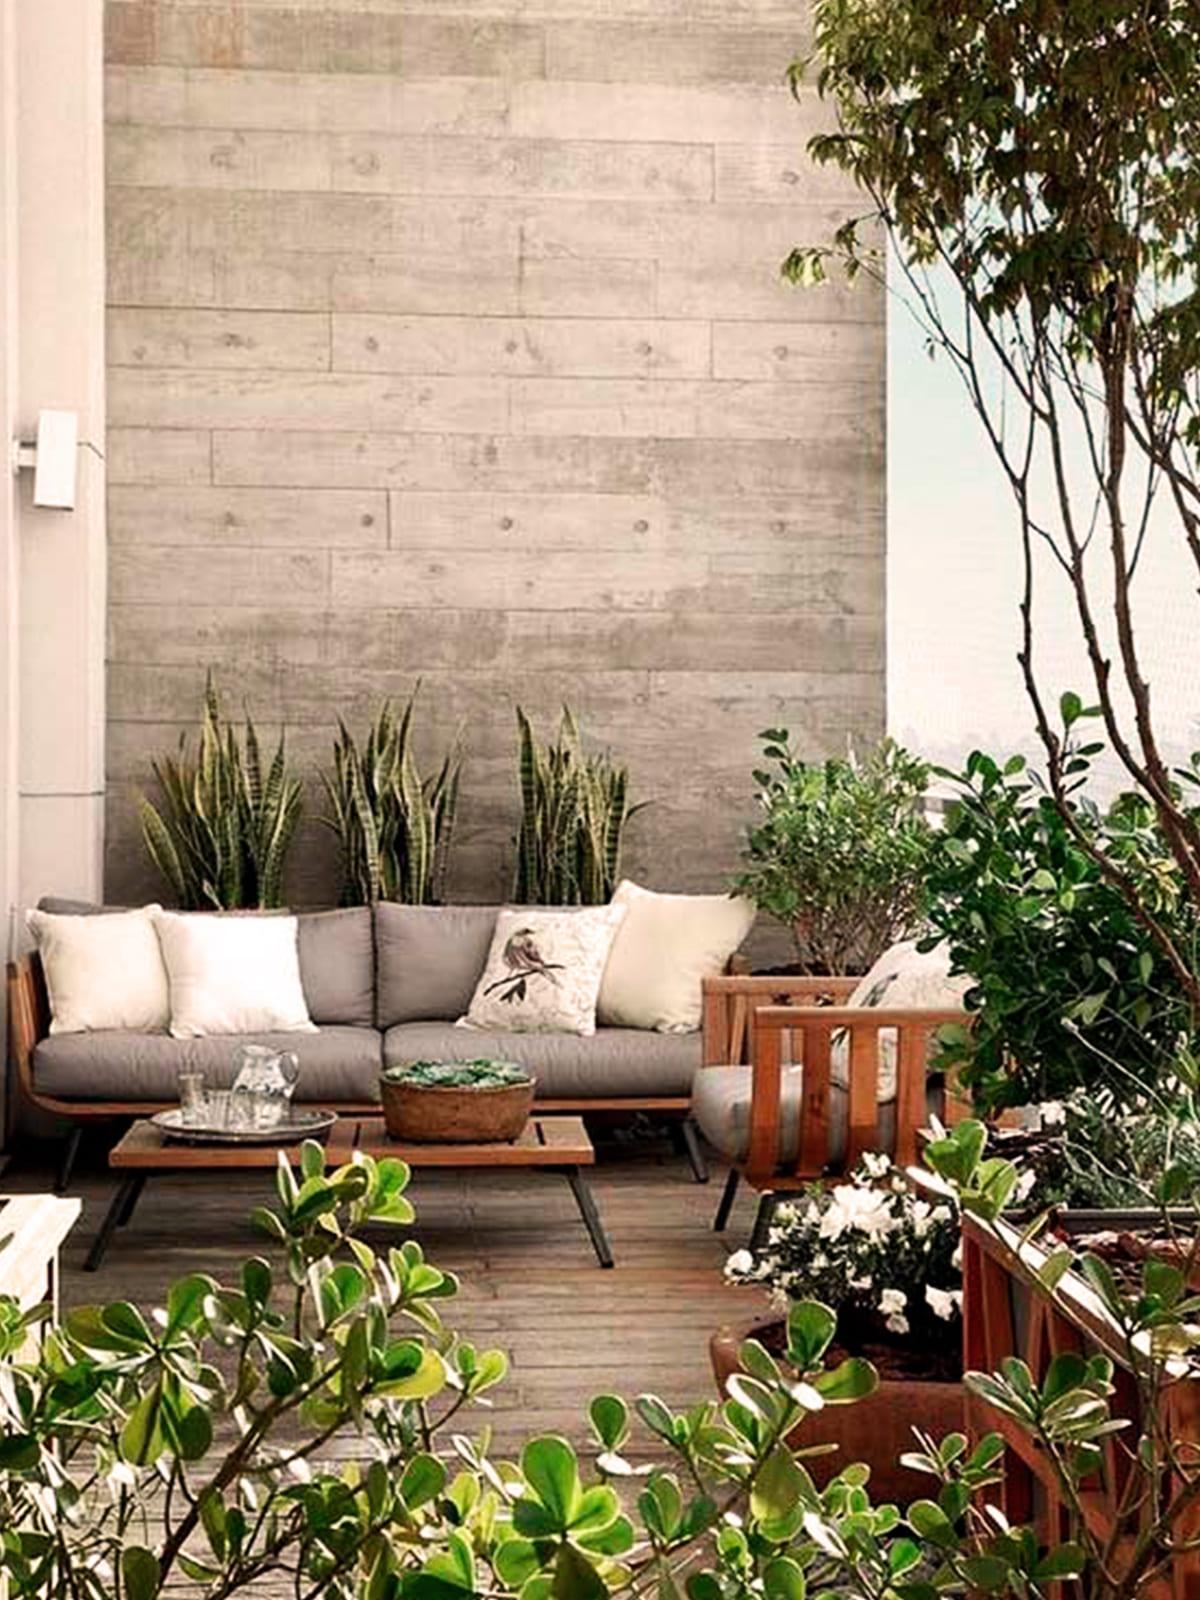 blog-vegetacion-decoracion-terrazas-balcones-09_HIDROJARDIN-Bañeres.jpg